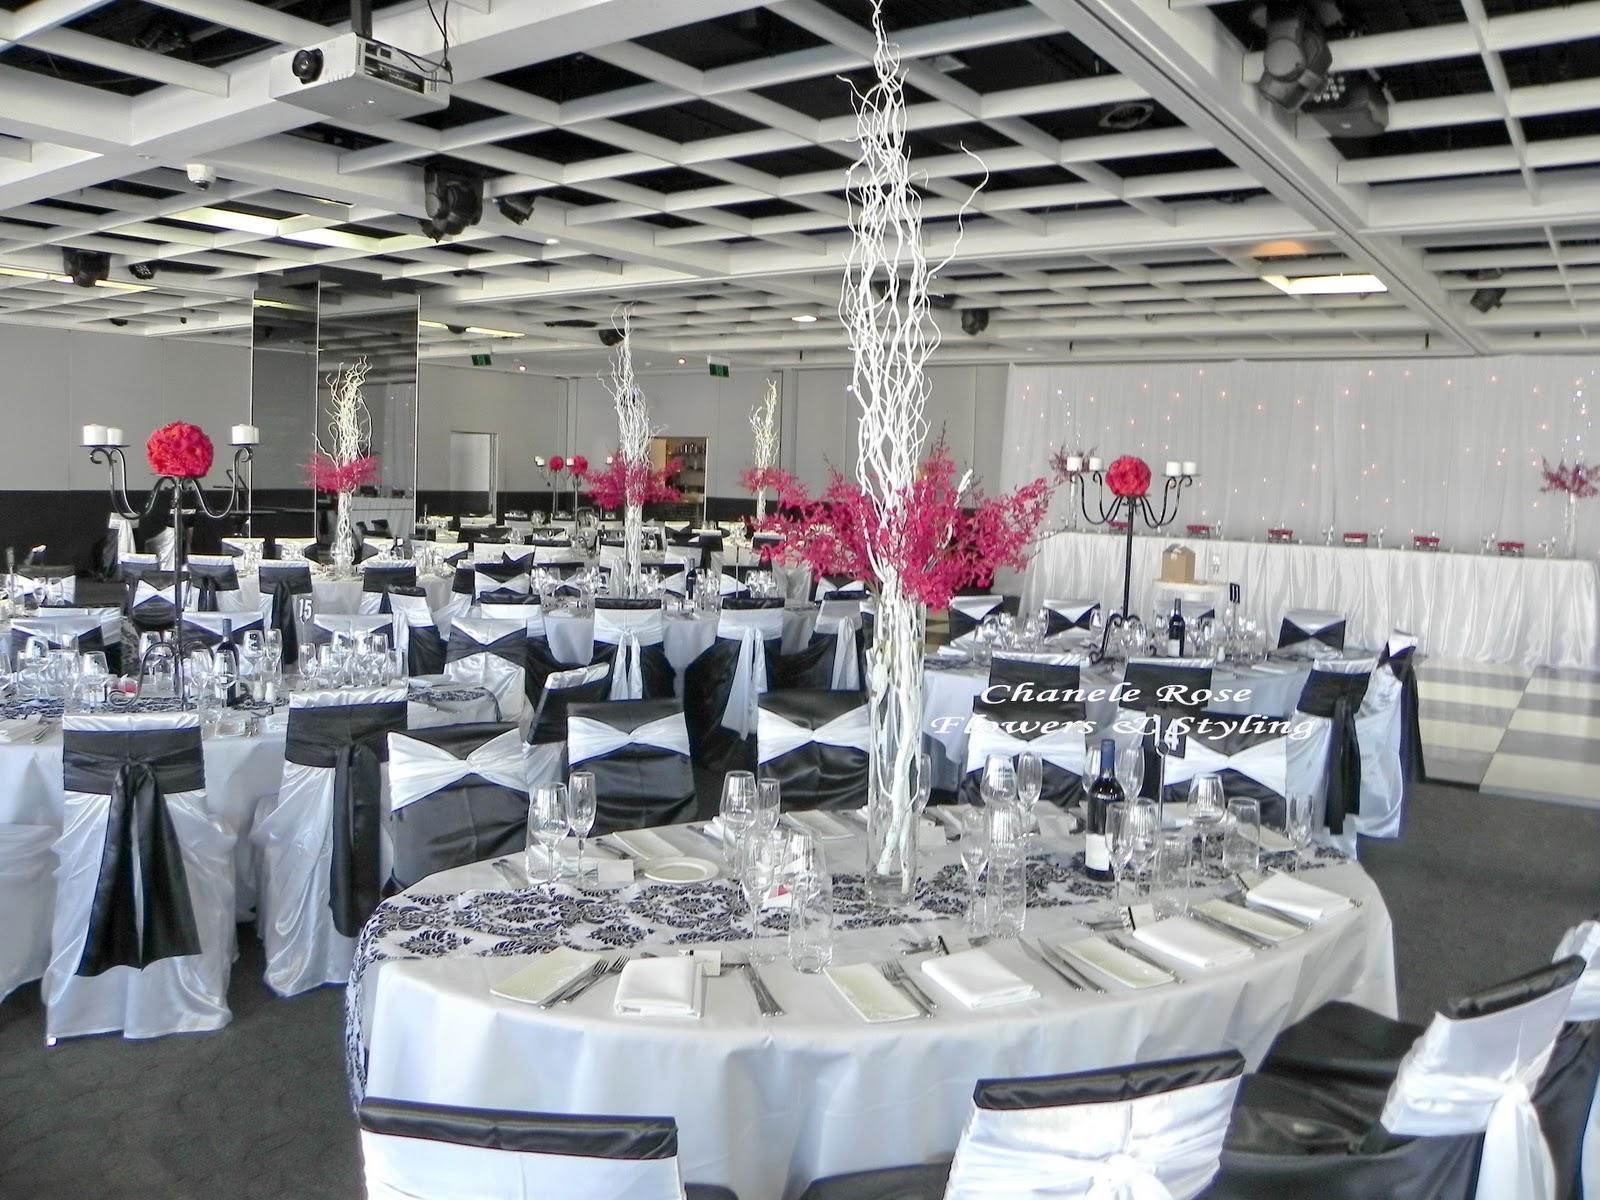 chanele rose flowers blog sydney wedding stylist florist damask rh chaneleroseflowers blogspot com Damask Wedding Reception Damask Wedding Supplies